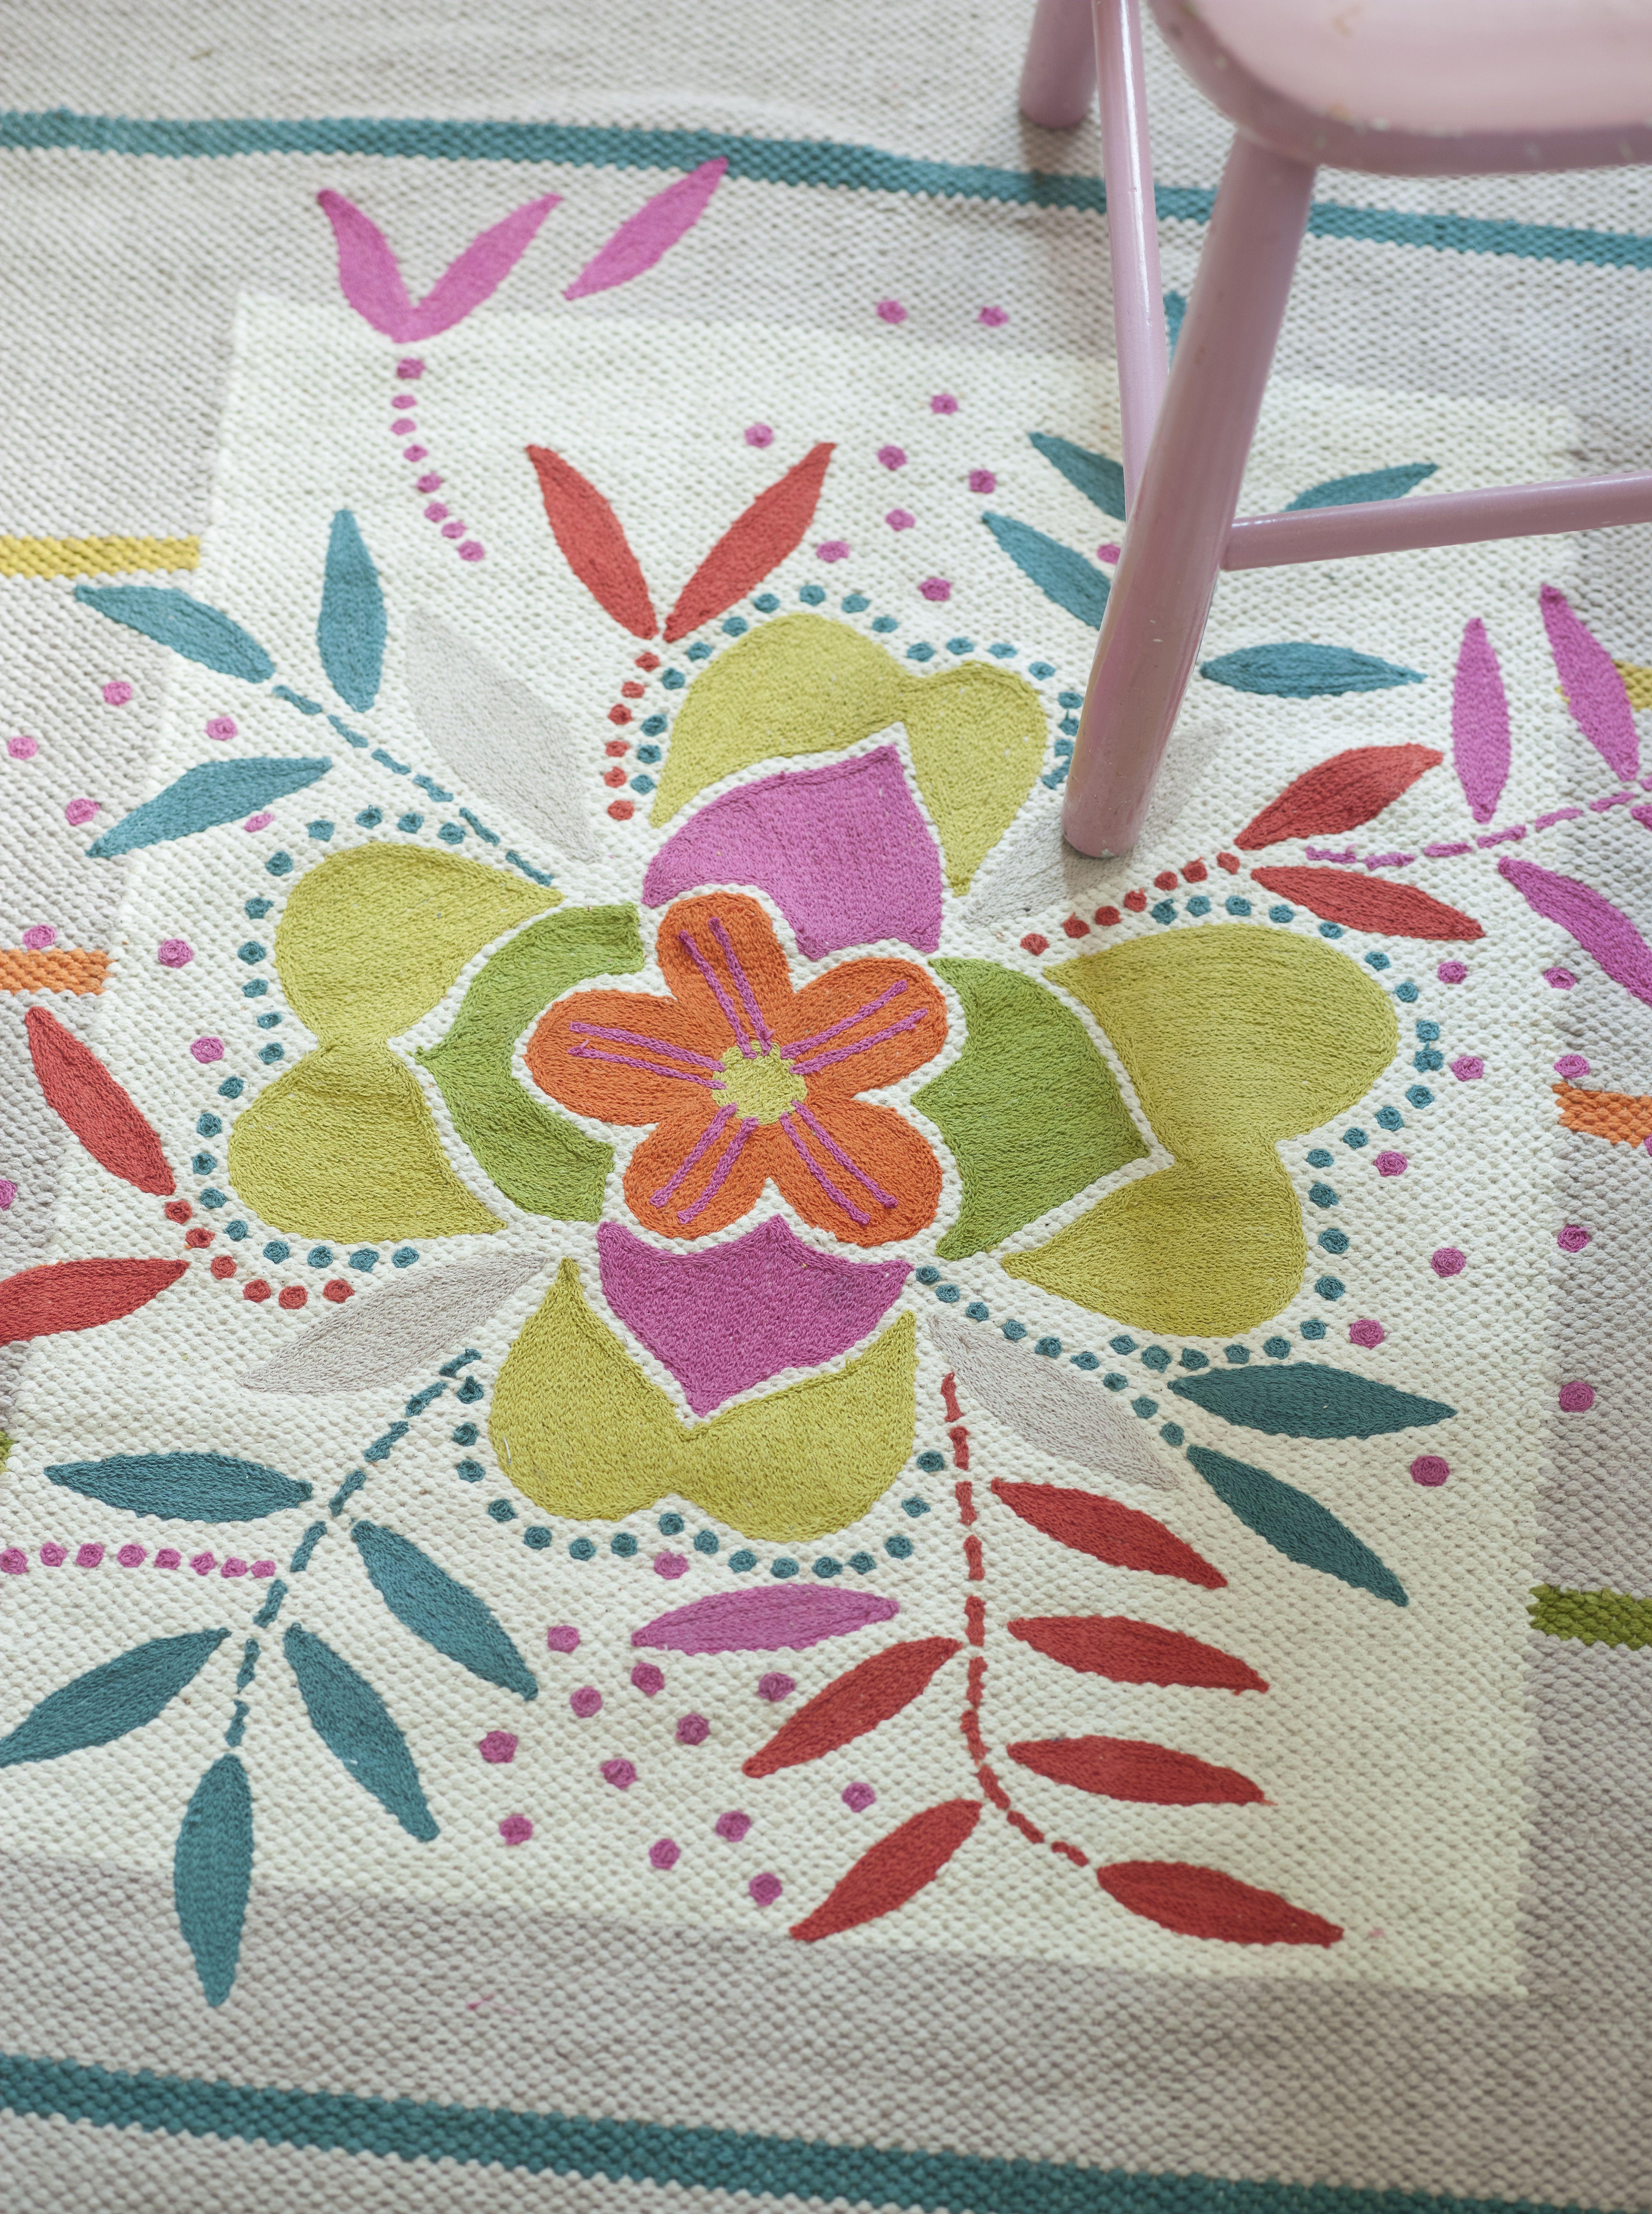 gudrun sj d ns sommerkollektion 2015 gestreifter teppich aus baumwolle in der gr e 80x160 cm. Black Bedroom Furniture Sets. Home Design Ideas